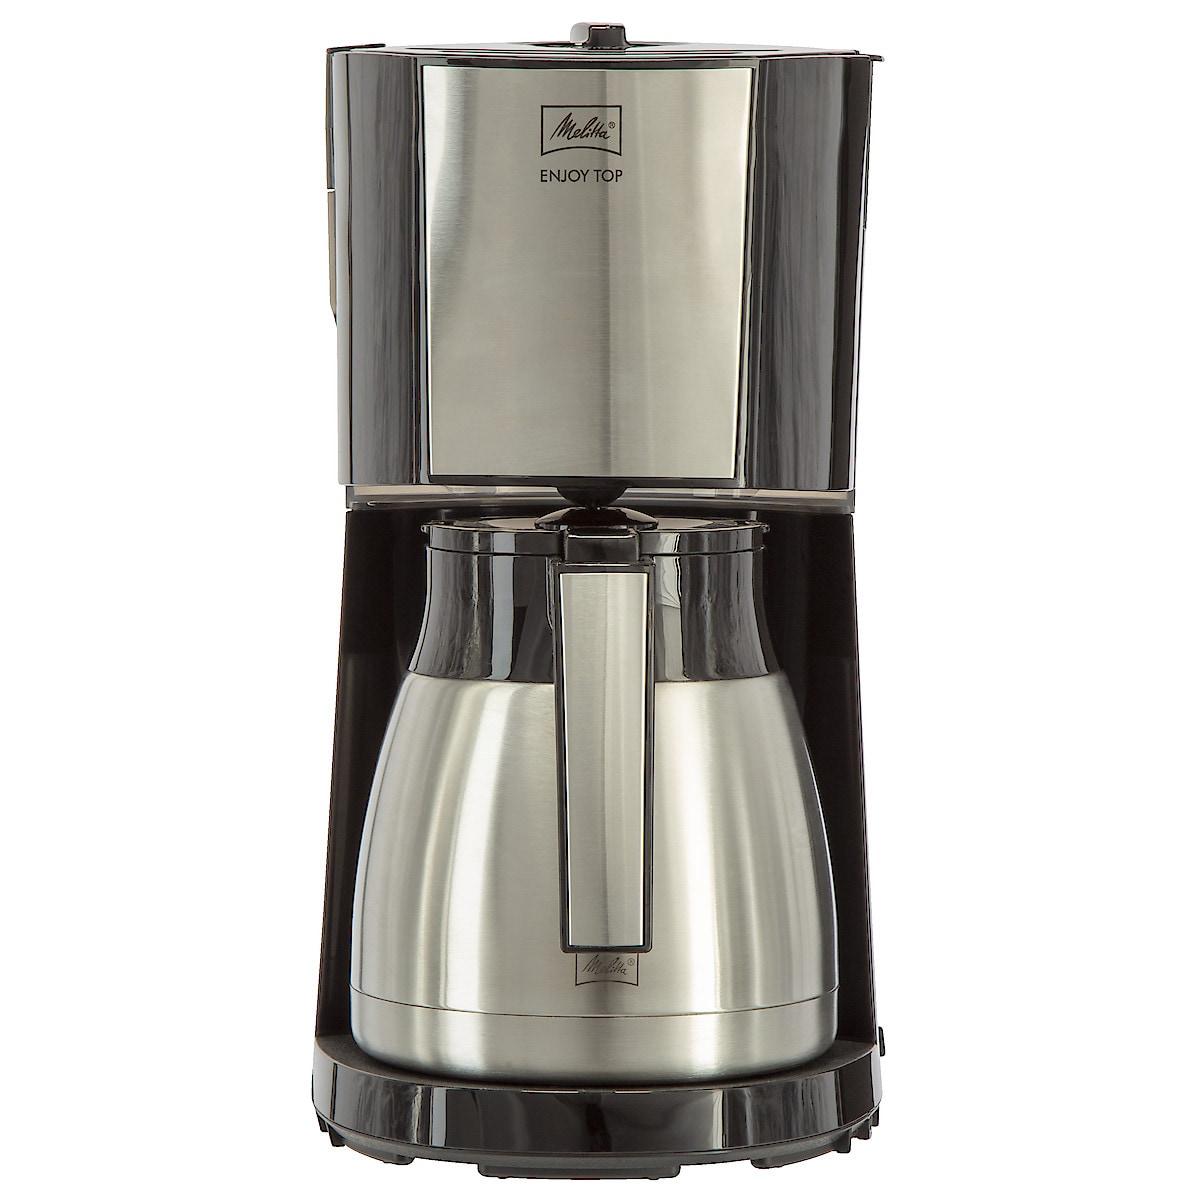 Kaffeemaschine mit Isolierkanne Melitta Enjoy 2.0 Top Therm